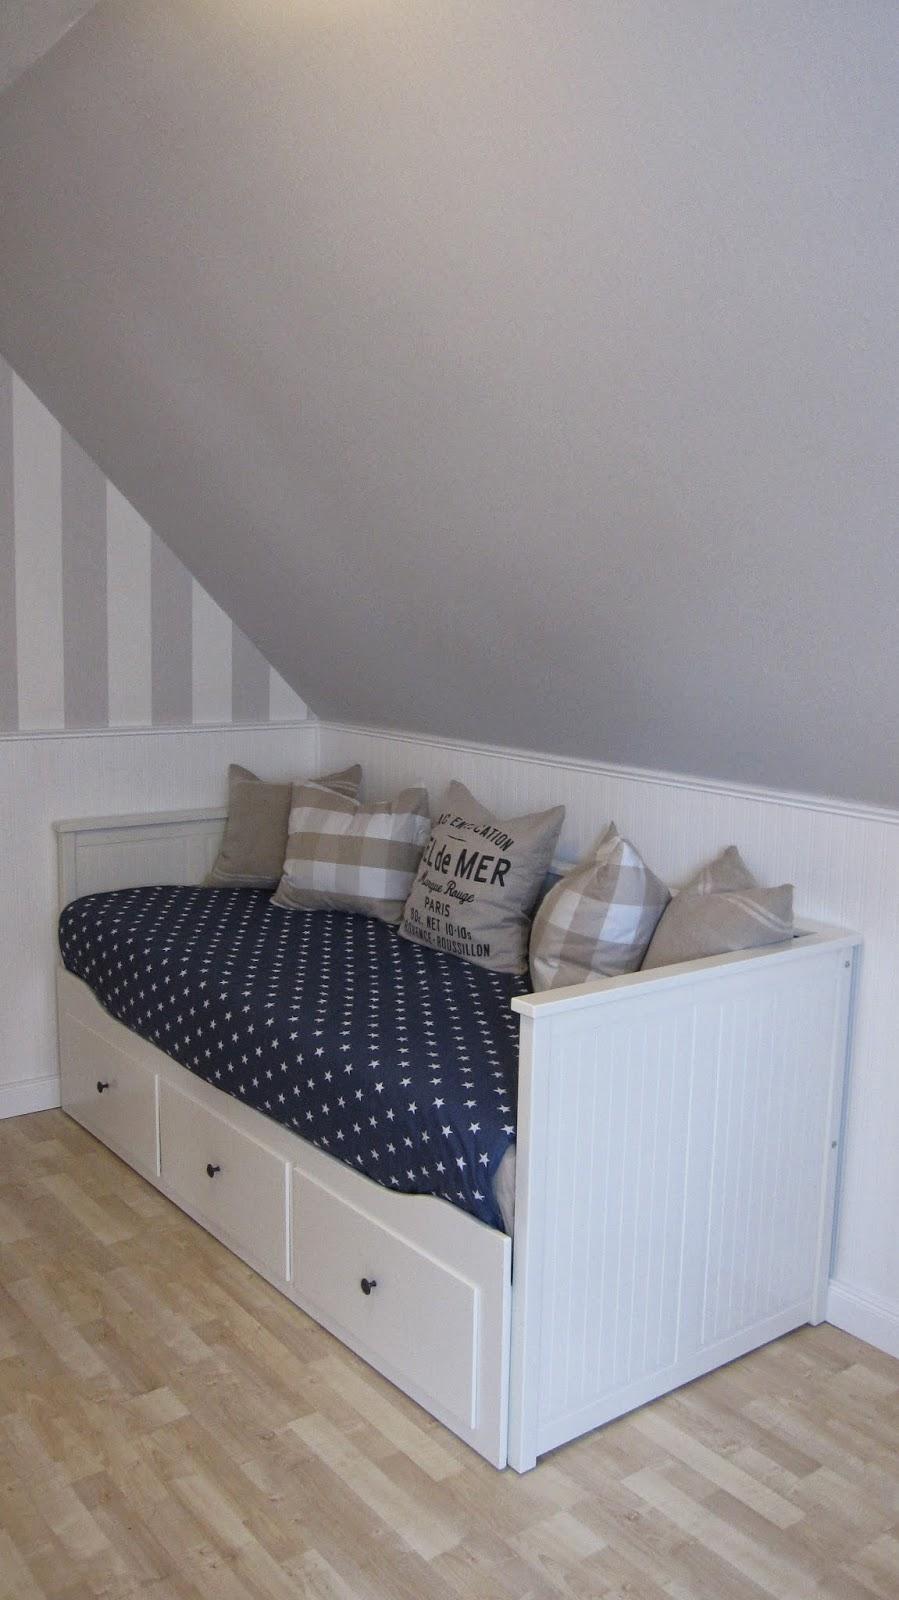 hemnes tagesbett ikea awesome large size of beliebtes. Black Bedroom Furniture Sets. Home Design Ideas